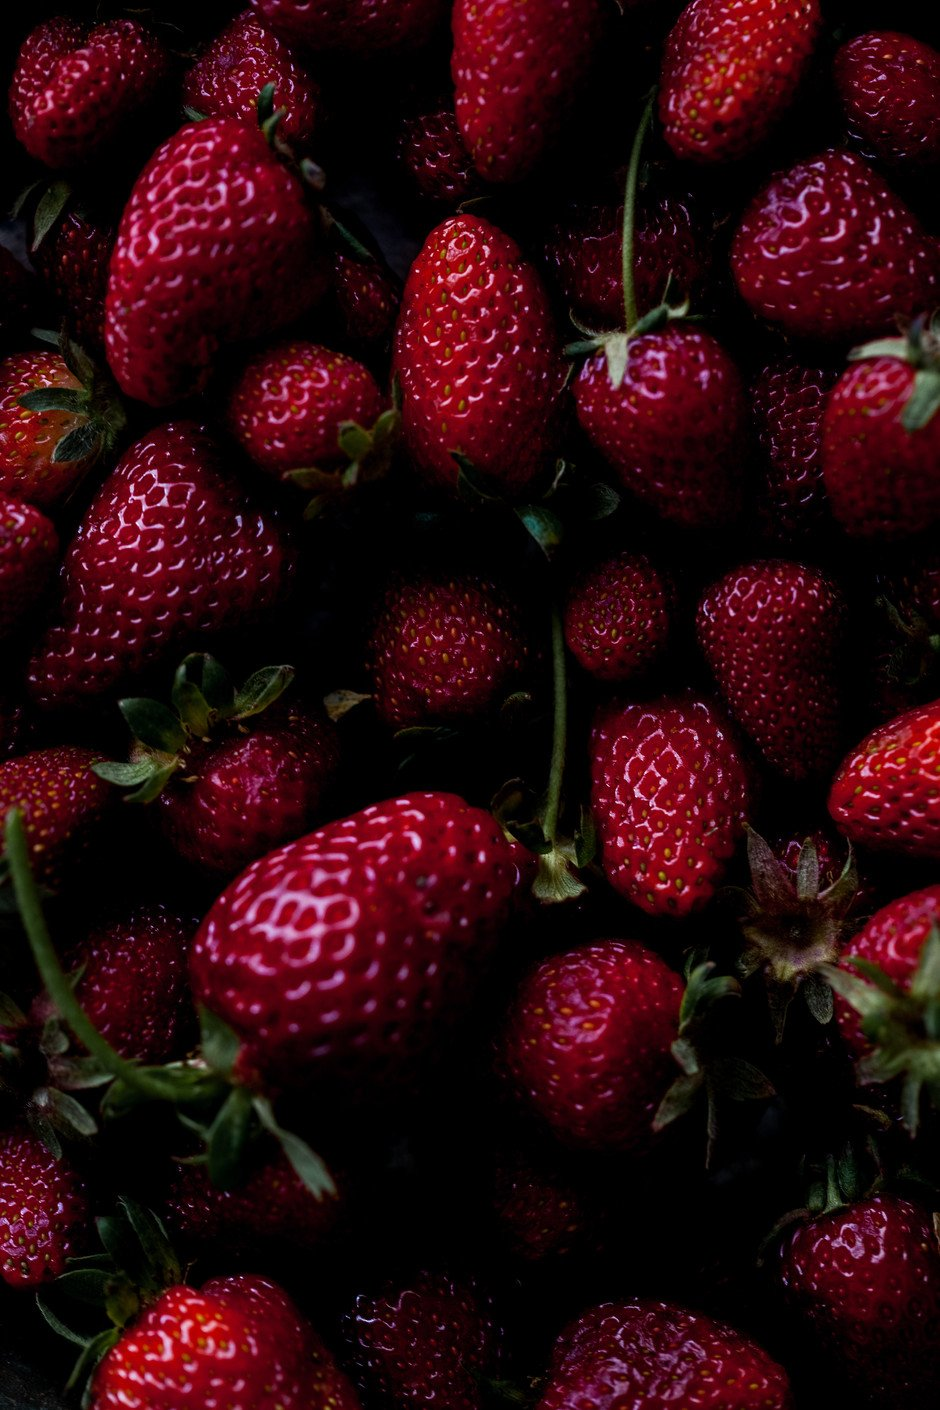 overhead closeup view of fresh strawberries.